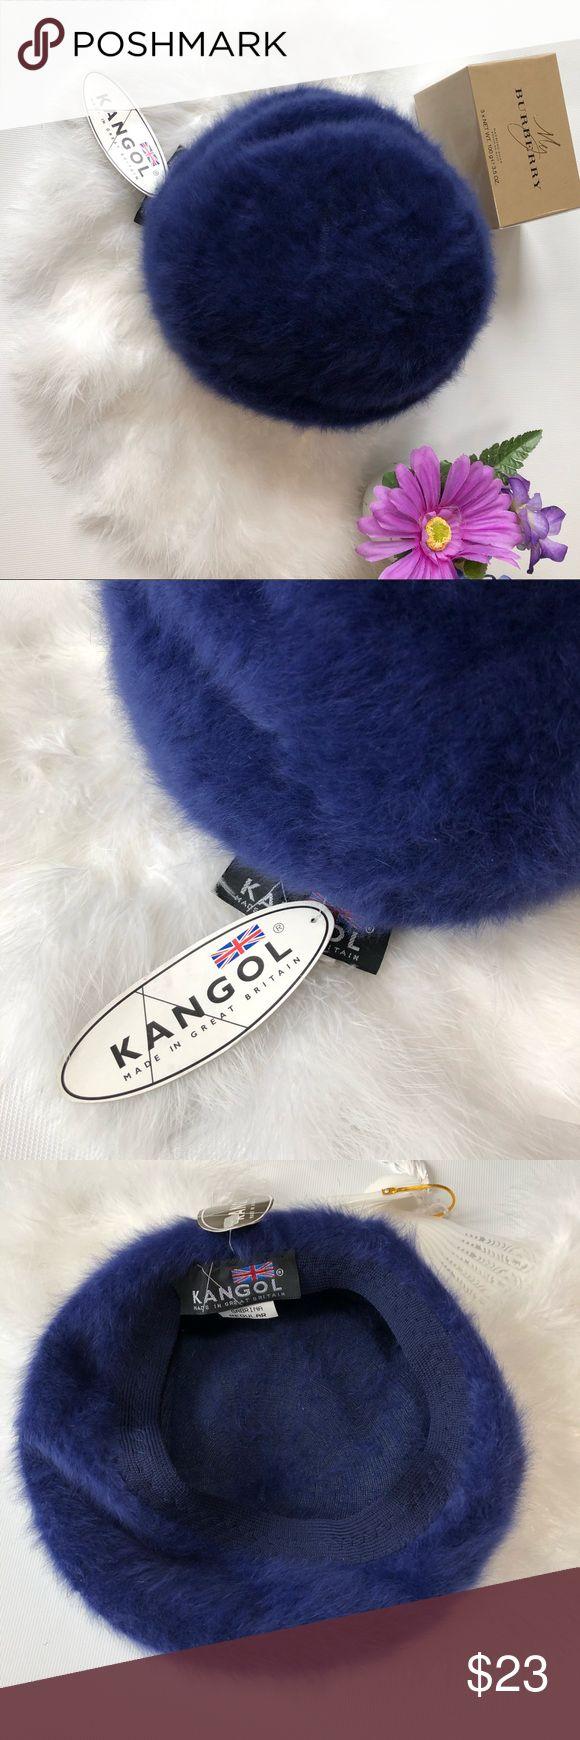 NWT KANGOL FURGORA  BERET BLUE RABBIT HAIR OS New with tags KANGOL FURGORA SABRINA REGULAR BERET. Blue . Please see pictures for material information. Kangol Accessories Hats